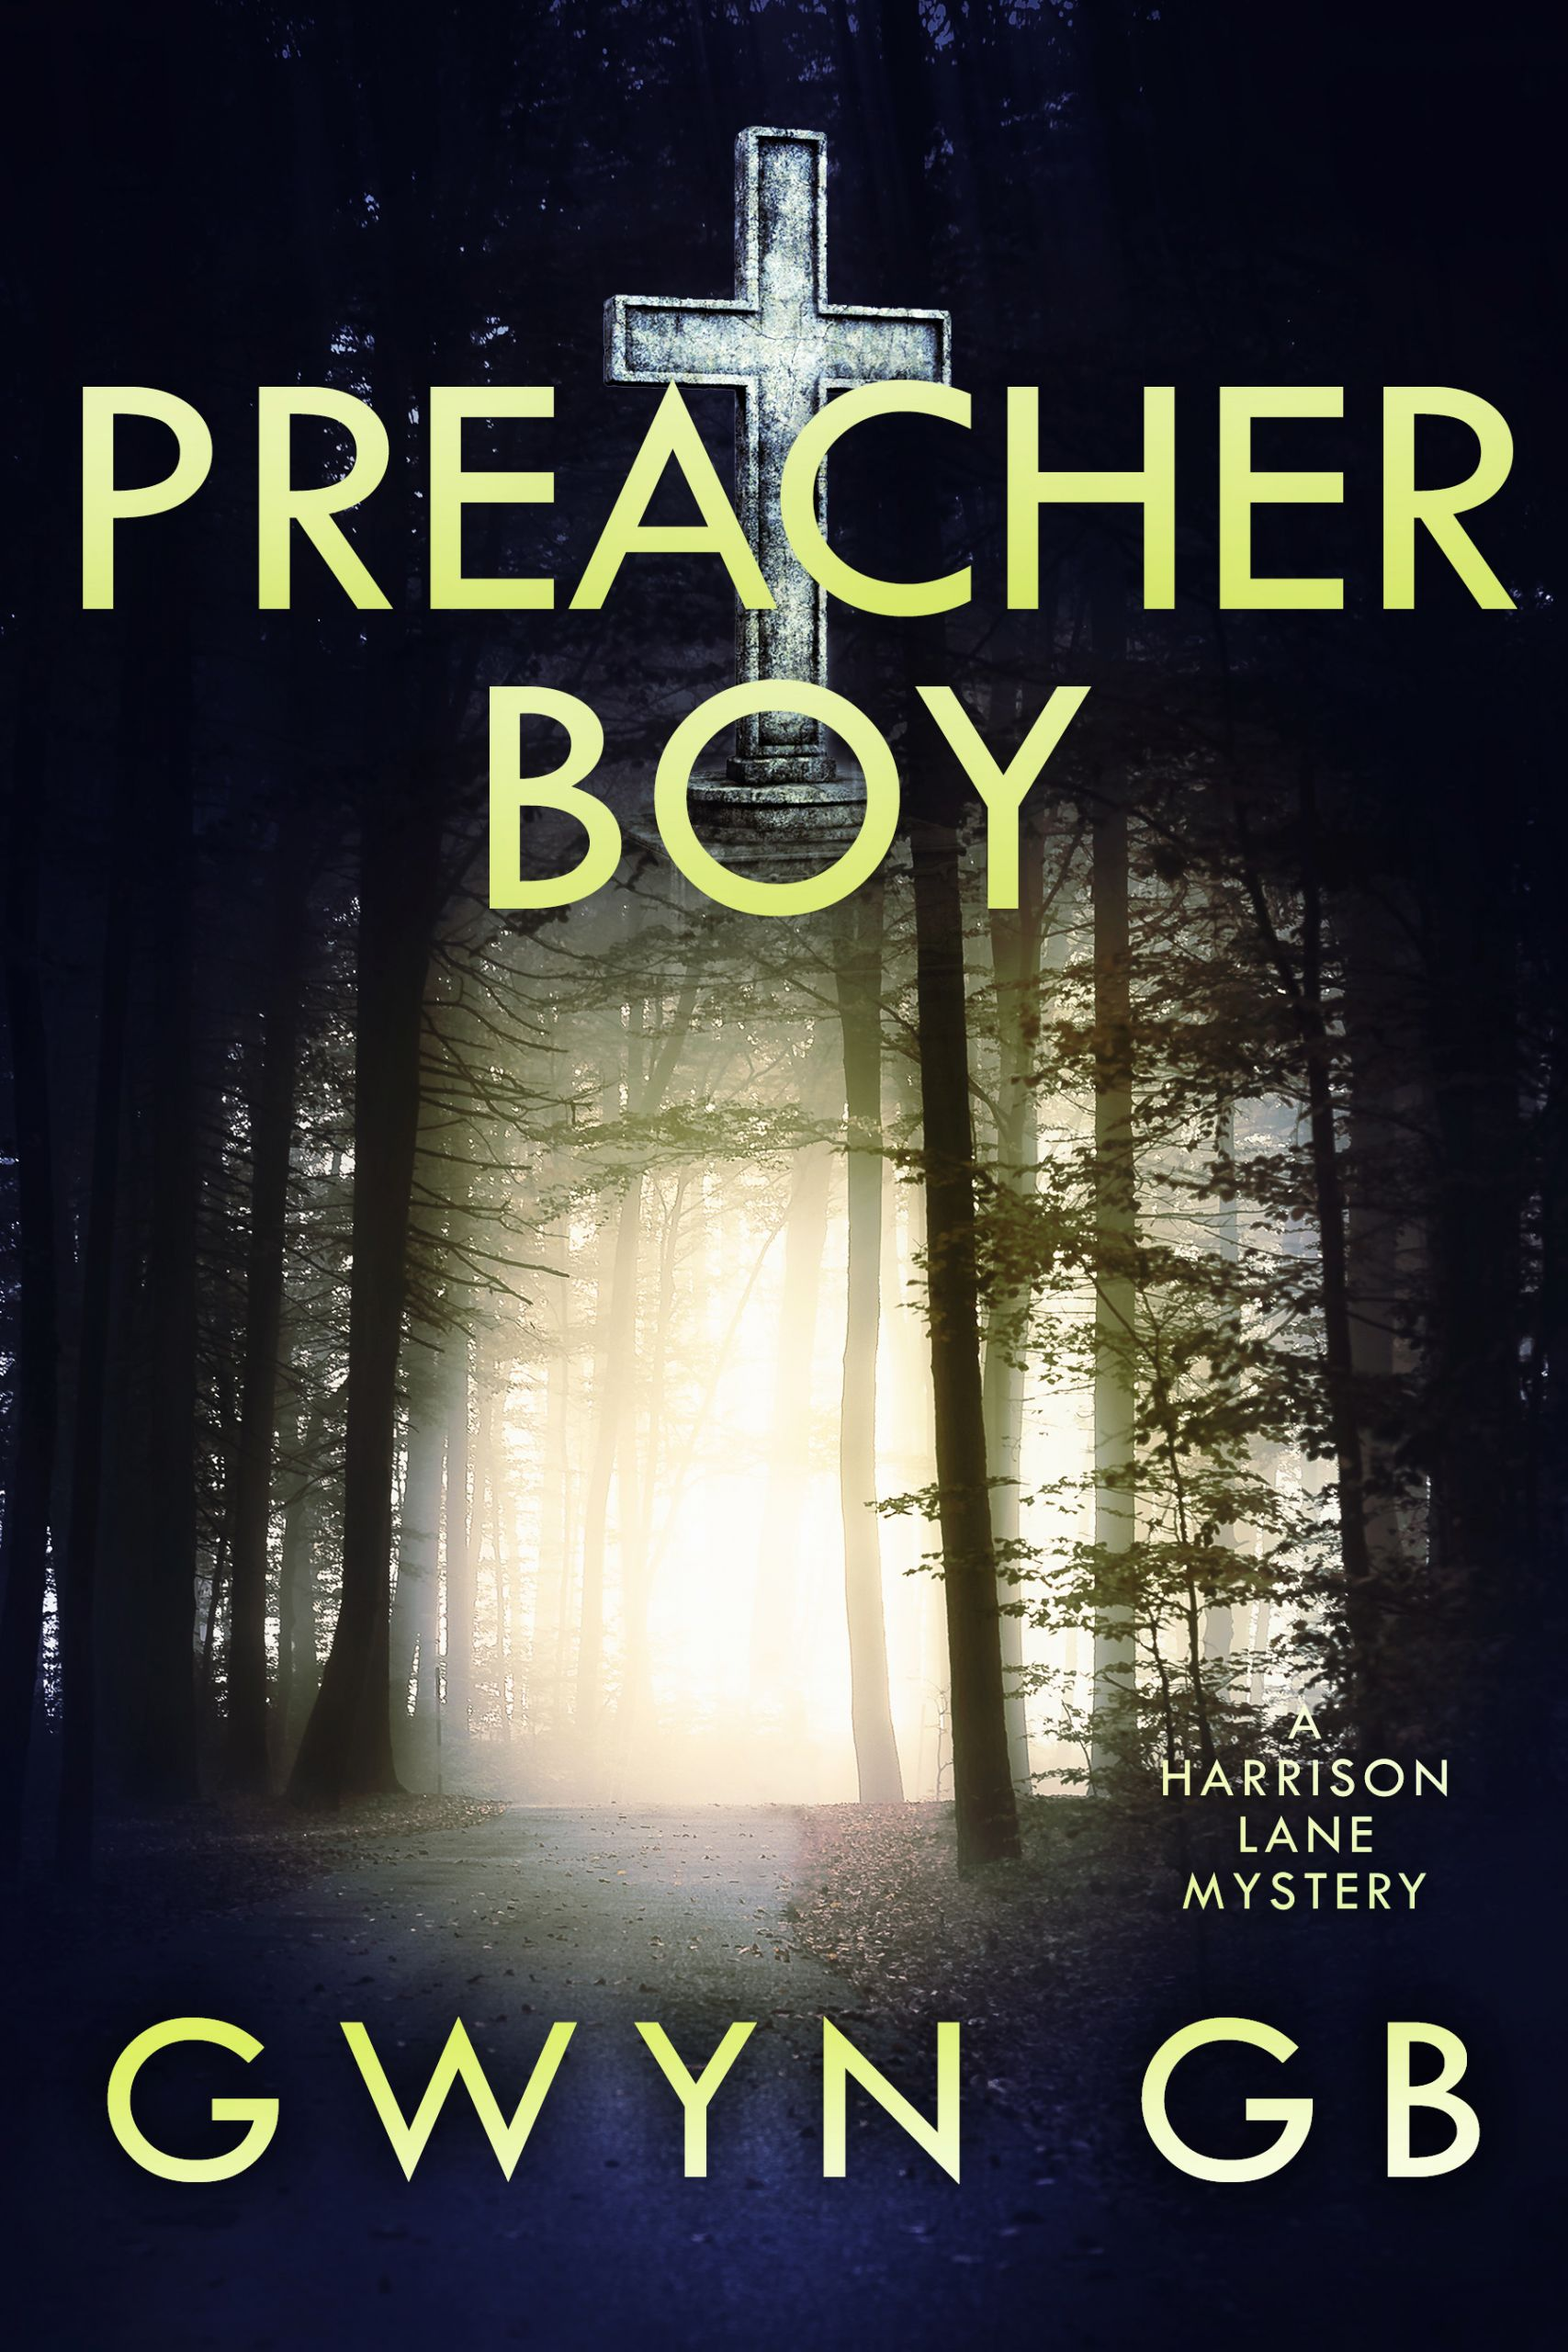 Cover Art for Preacher Boy